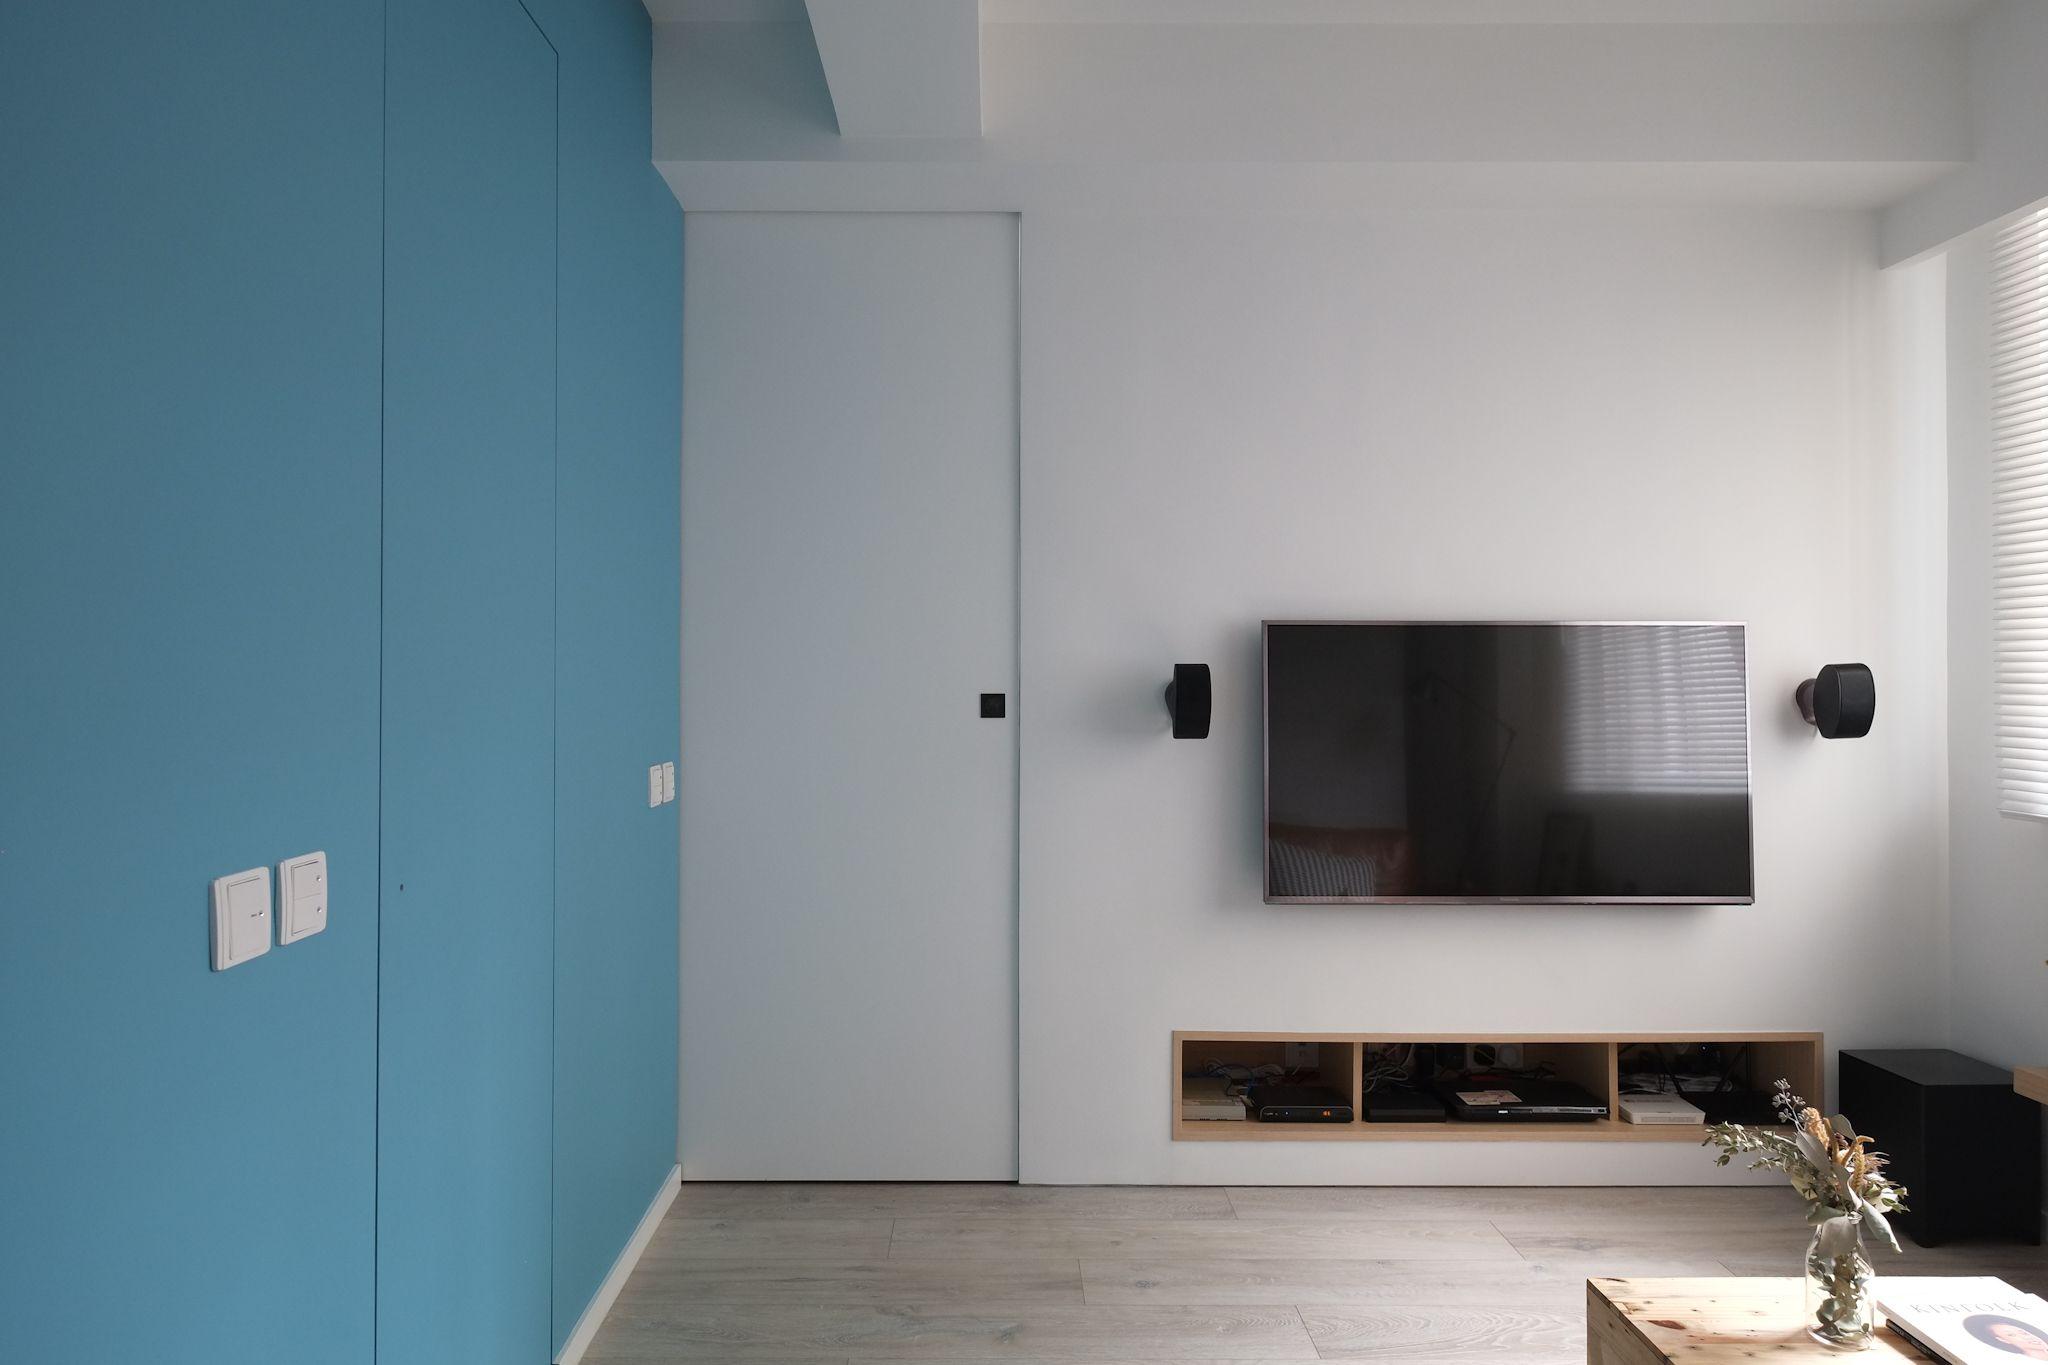 Apartment J&K, Hong Kong, 2015 by studioparti Tall